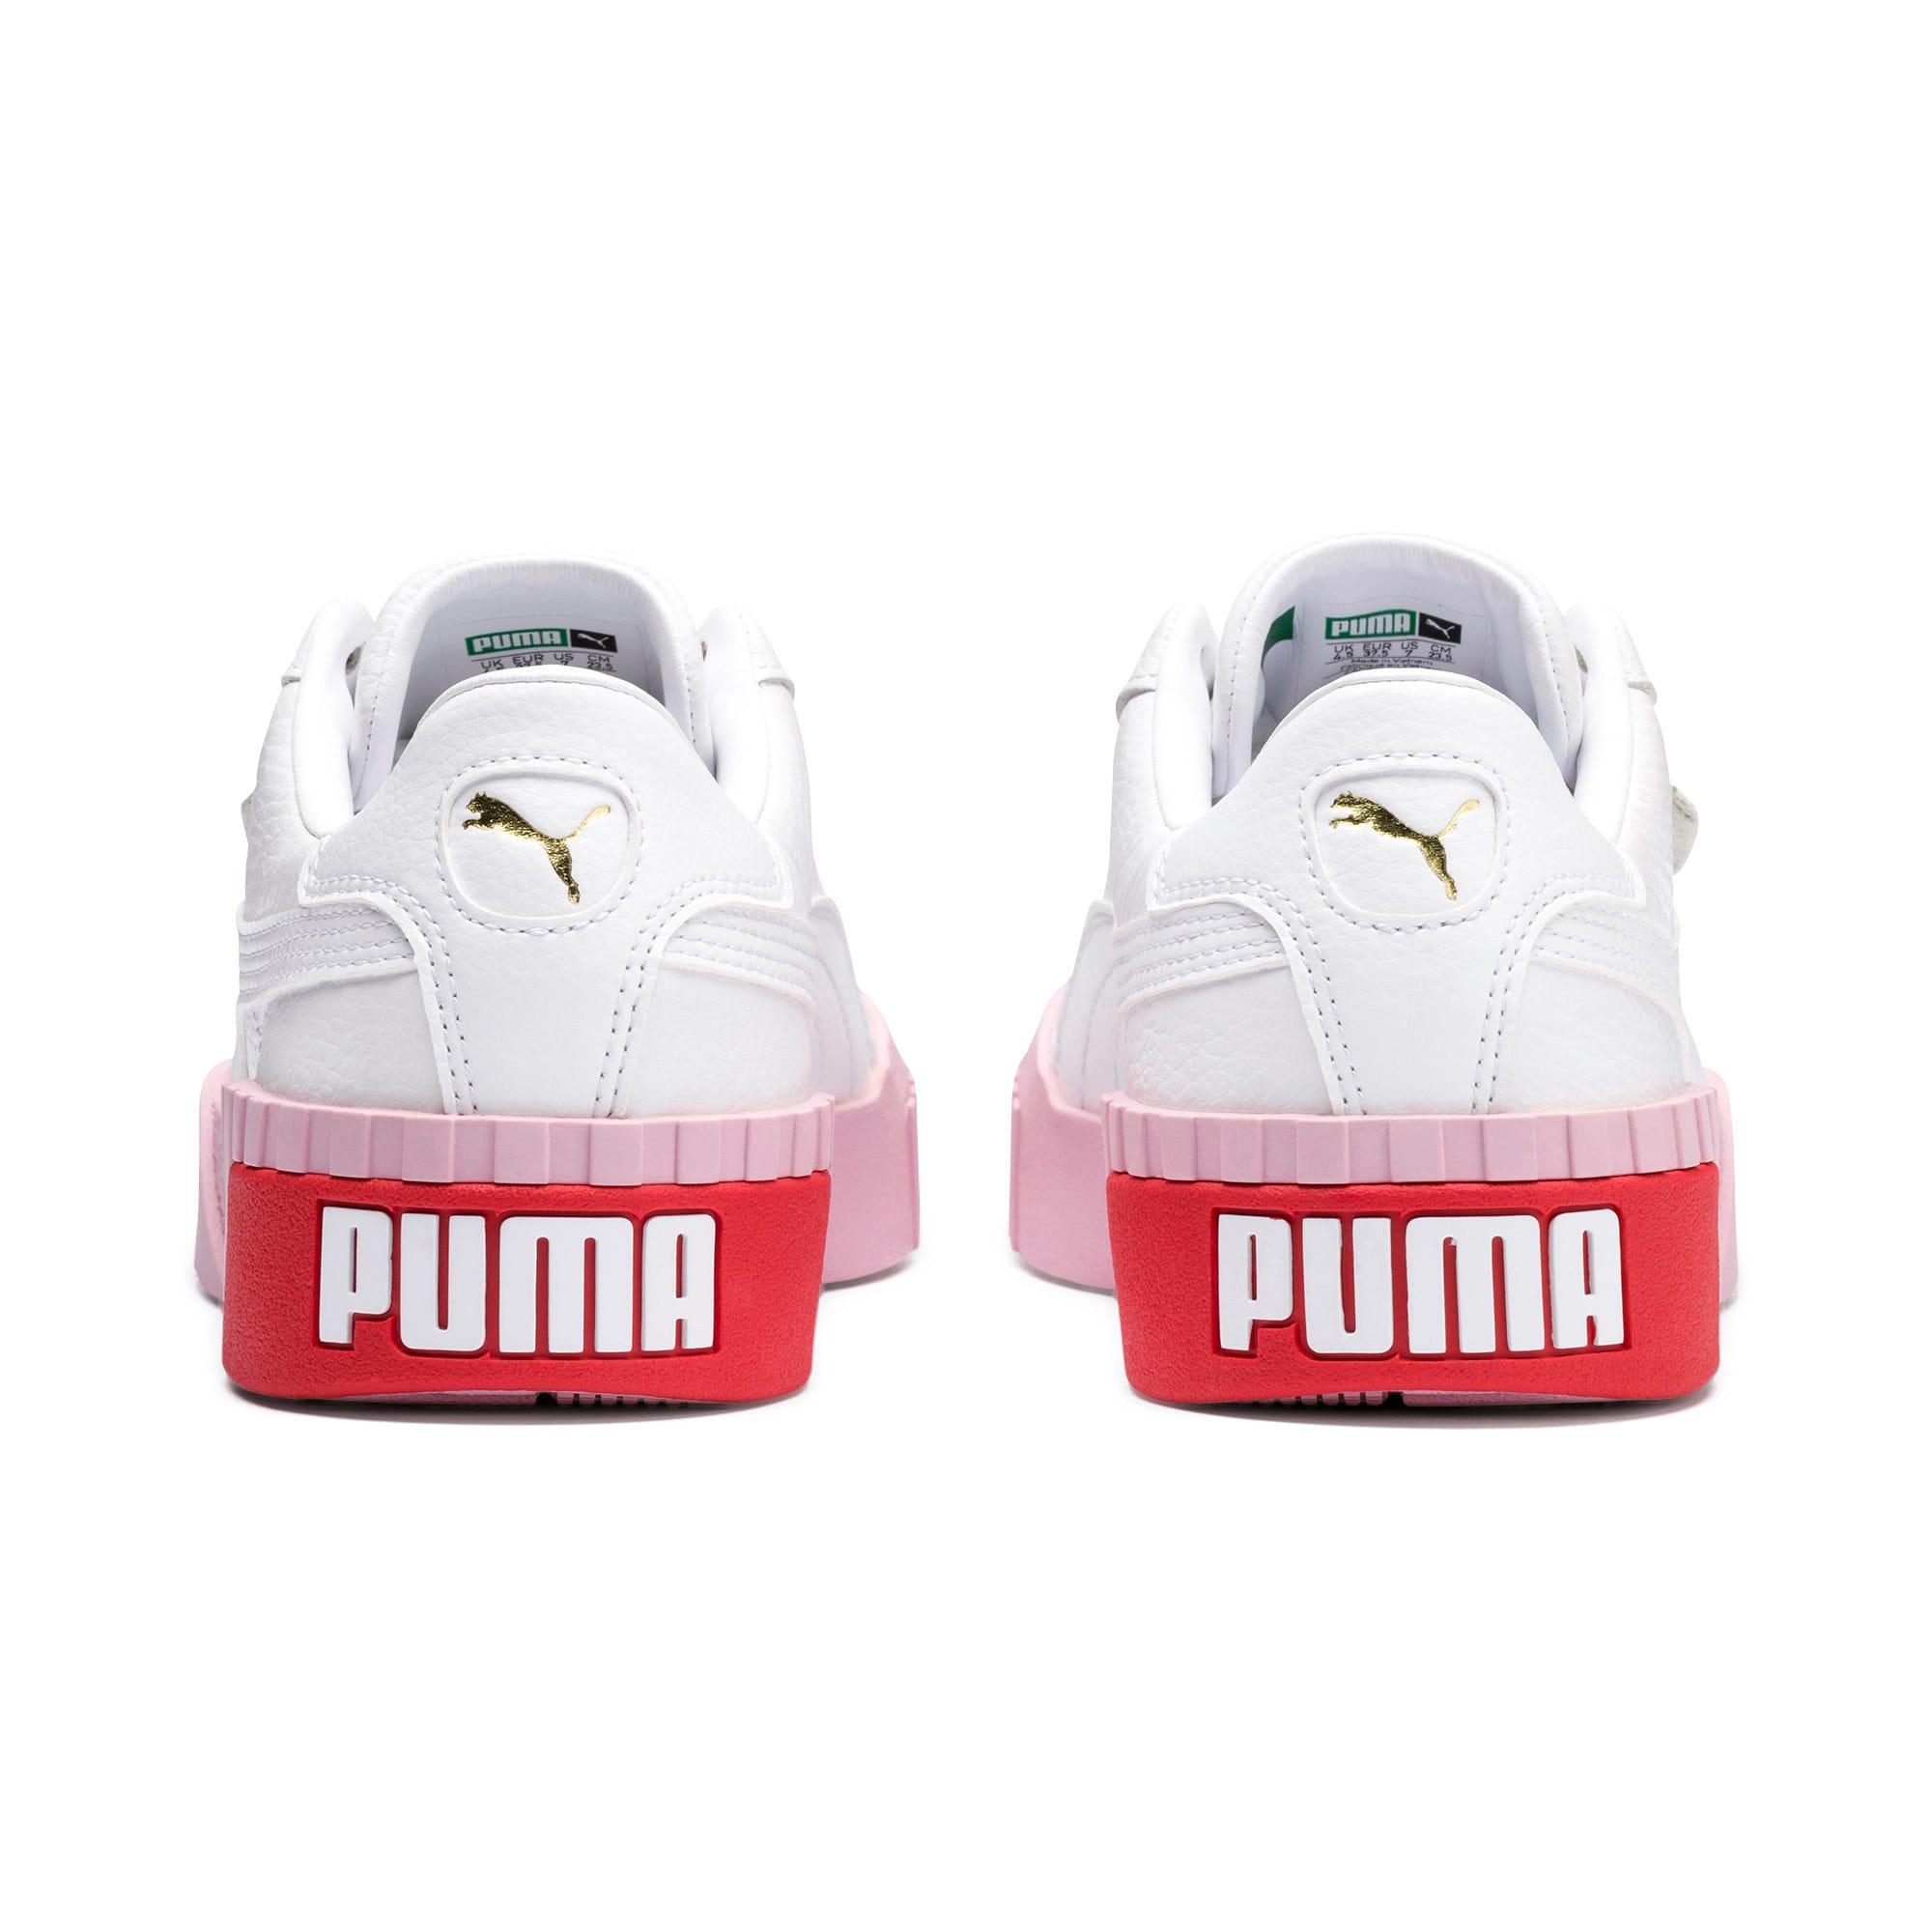 Thumbnail 4 of CALI ウィメンズ, Puma White-Pale Pink, medium-JPN